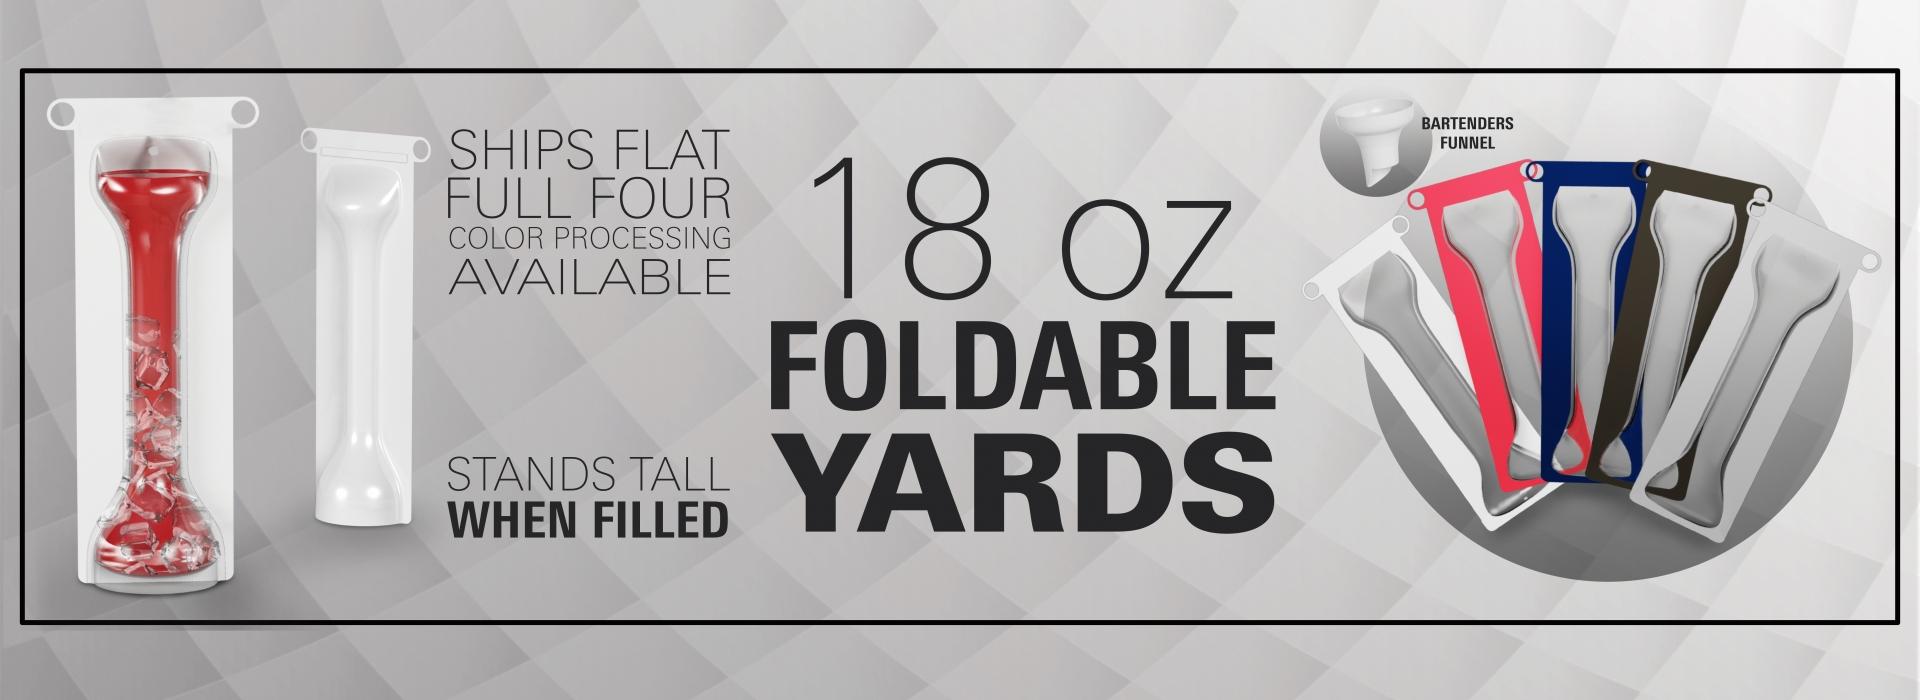 foldable yard